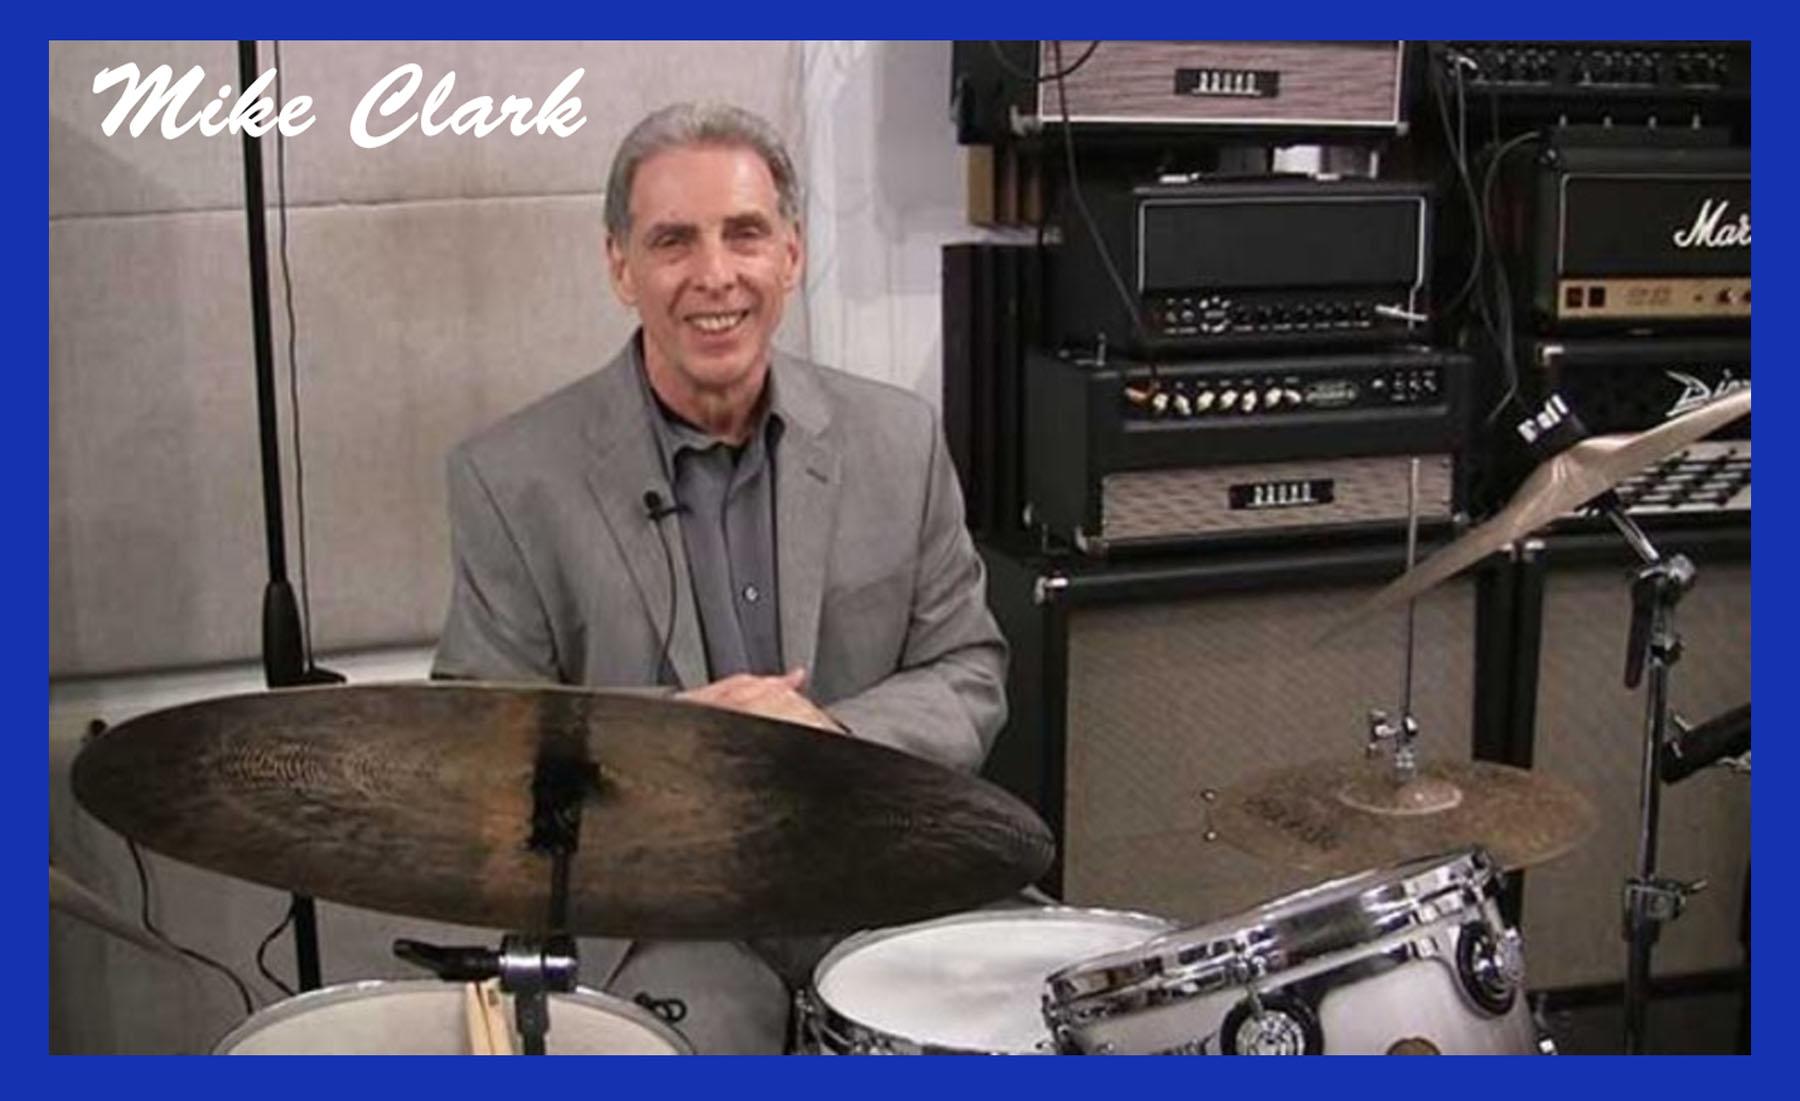 Chap-17-Pic-Mike-Clark (1).jpg